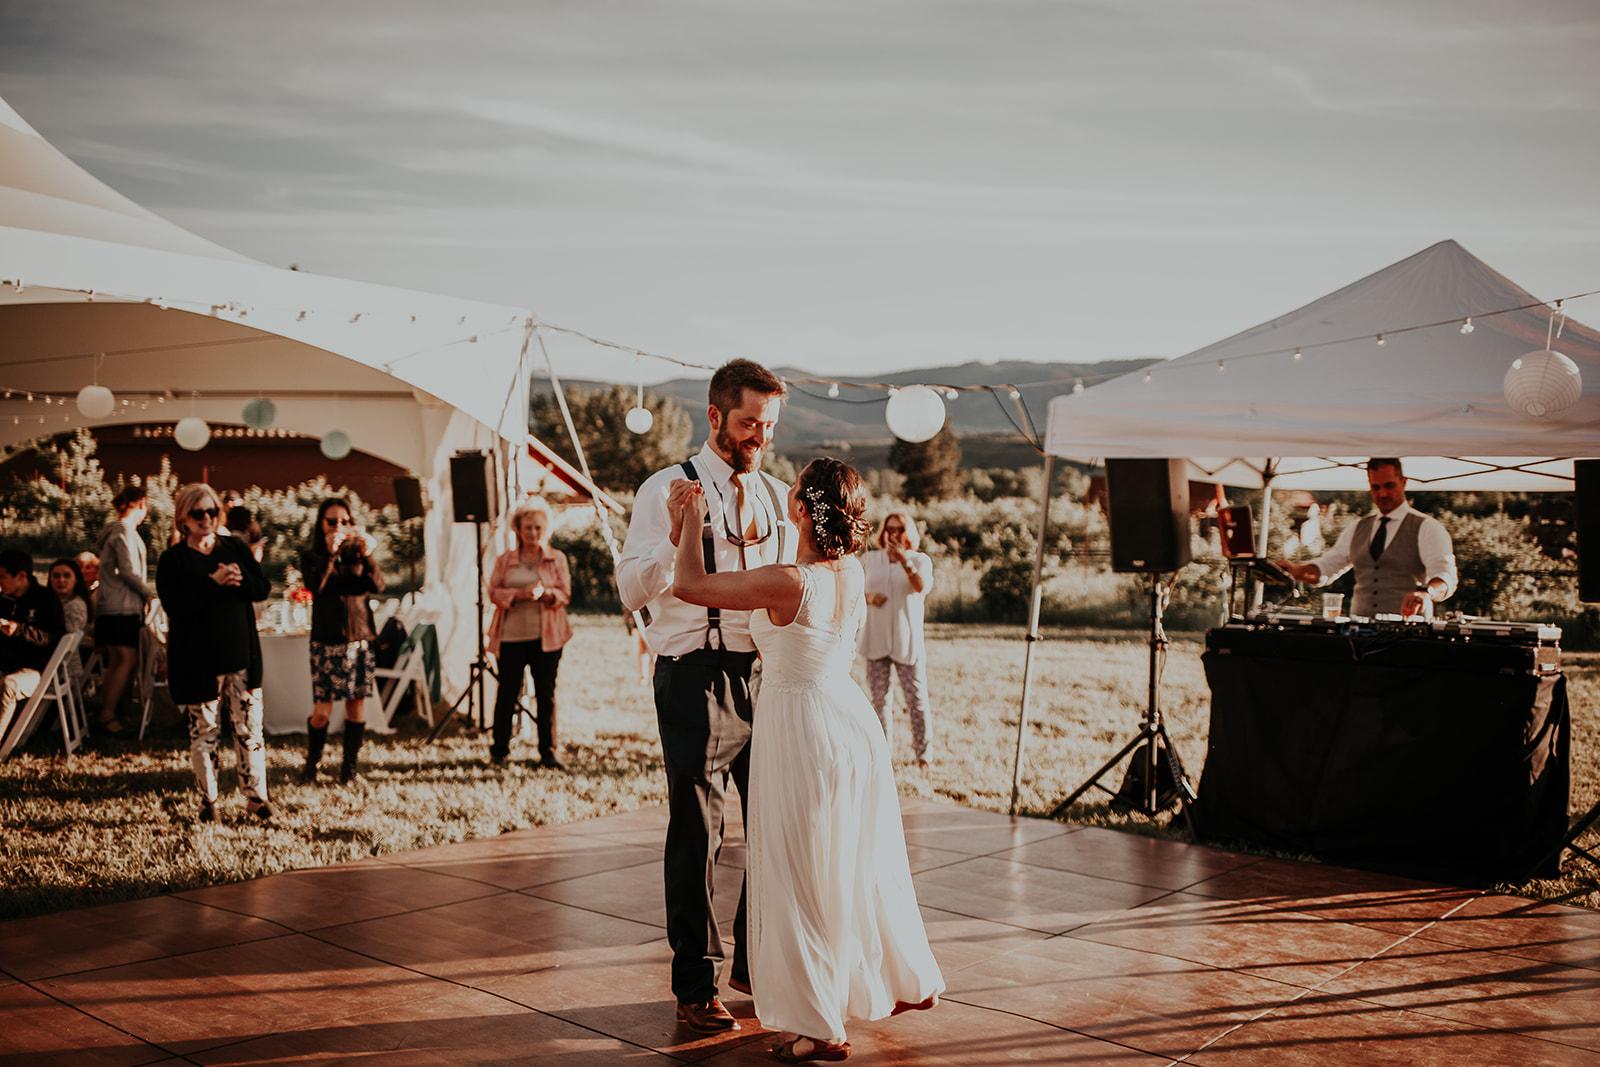 north-cascades-elopement-wedding-winthrop-wedding-photographer-megan-gallagher-photography (28).jpg